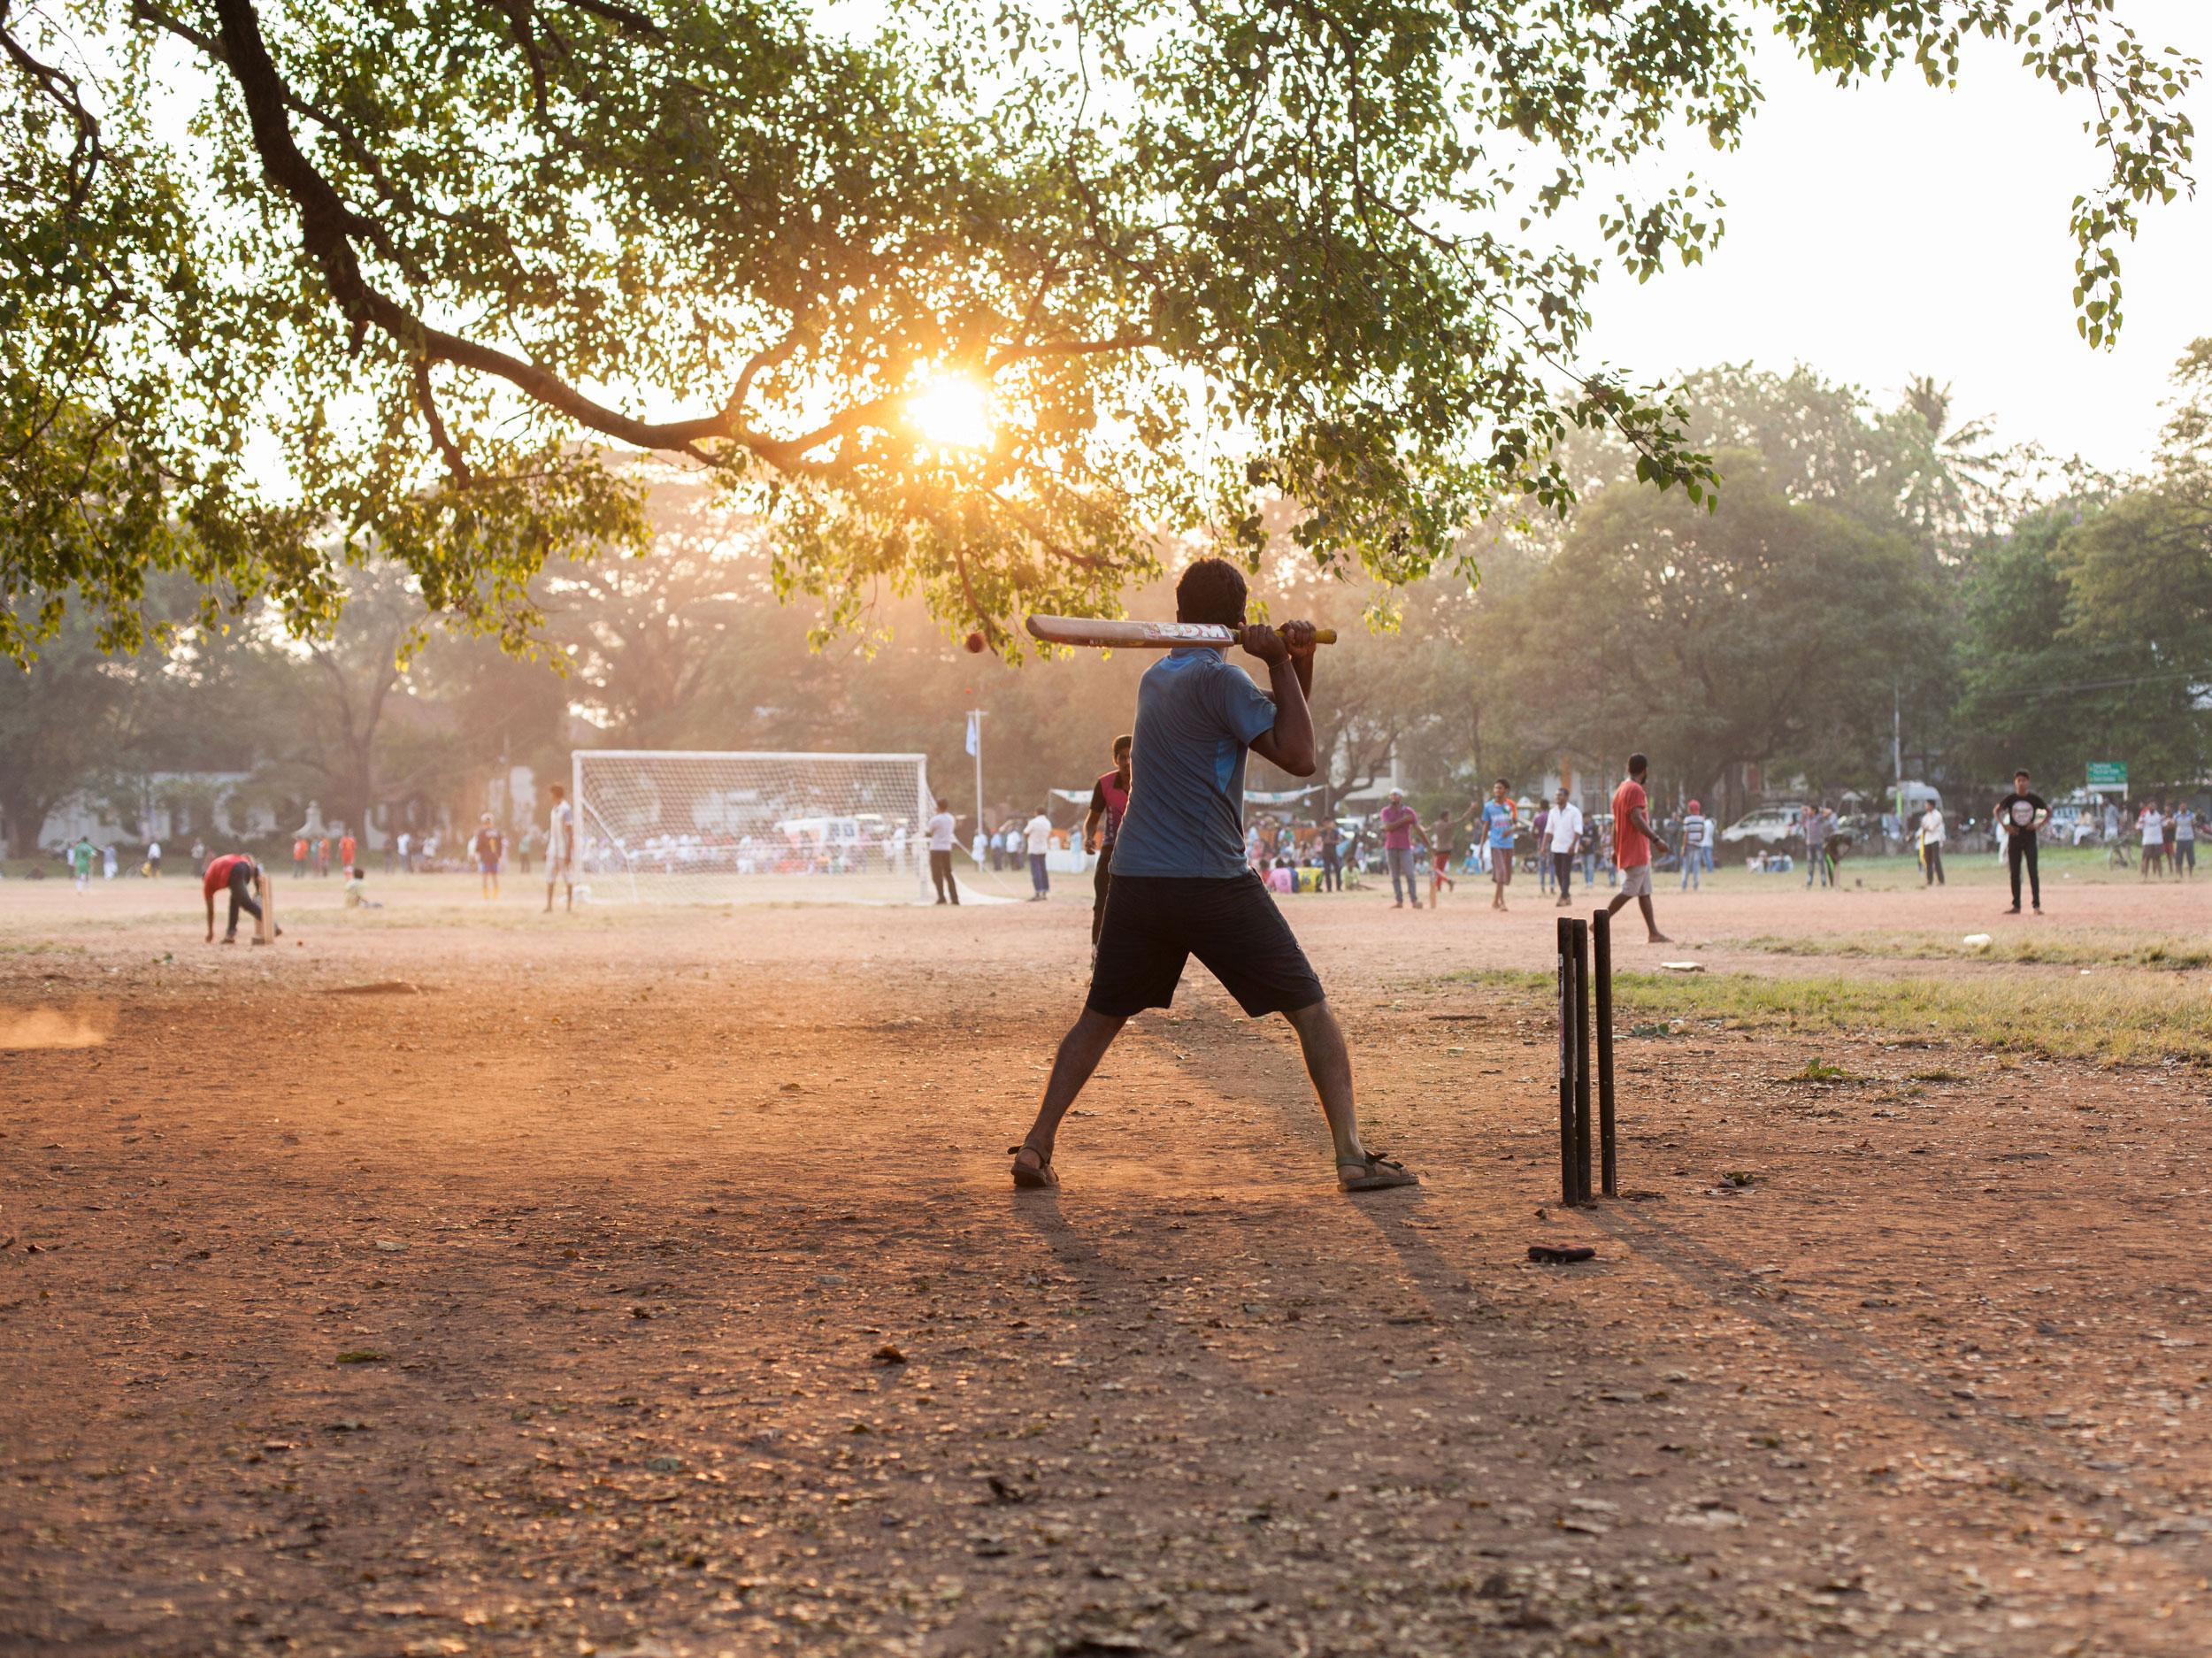 Julian-Ward-Kerela-Cricket.jpg